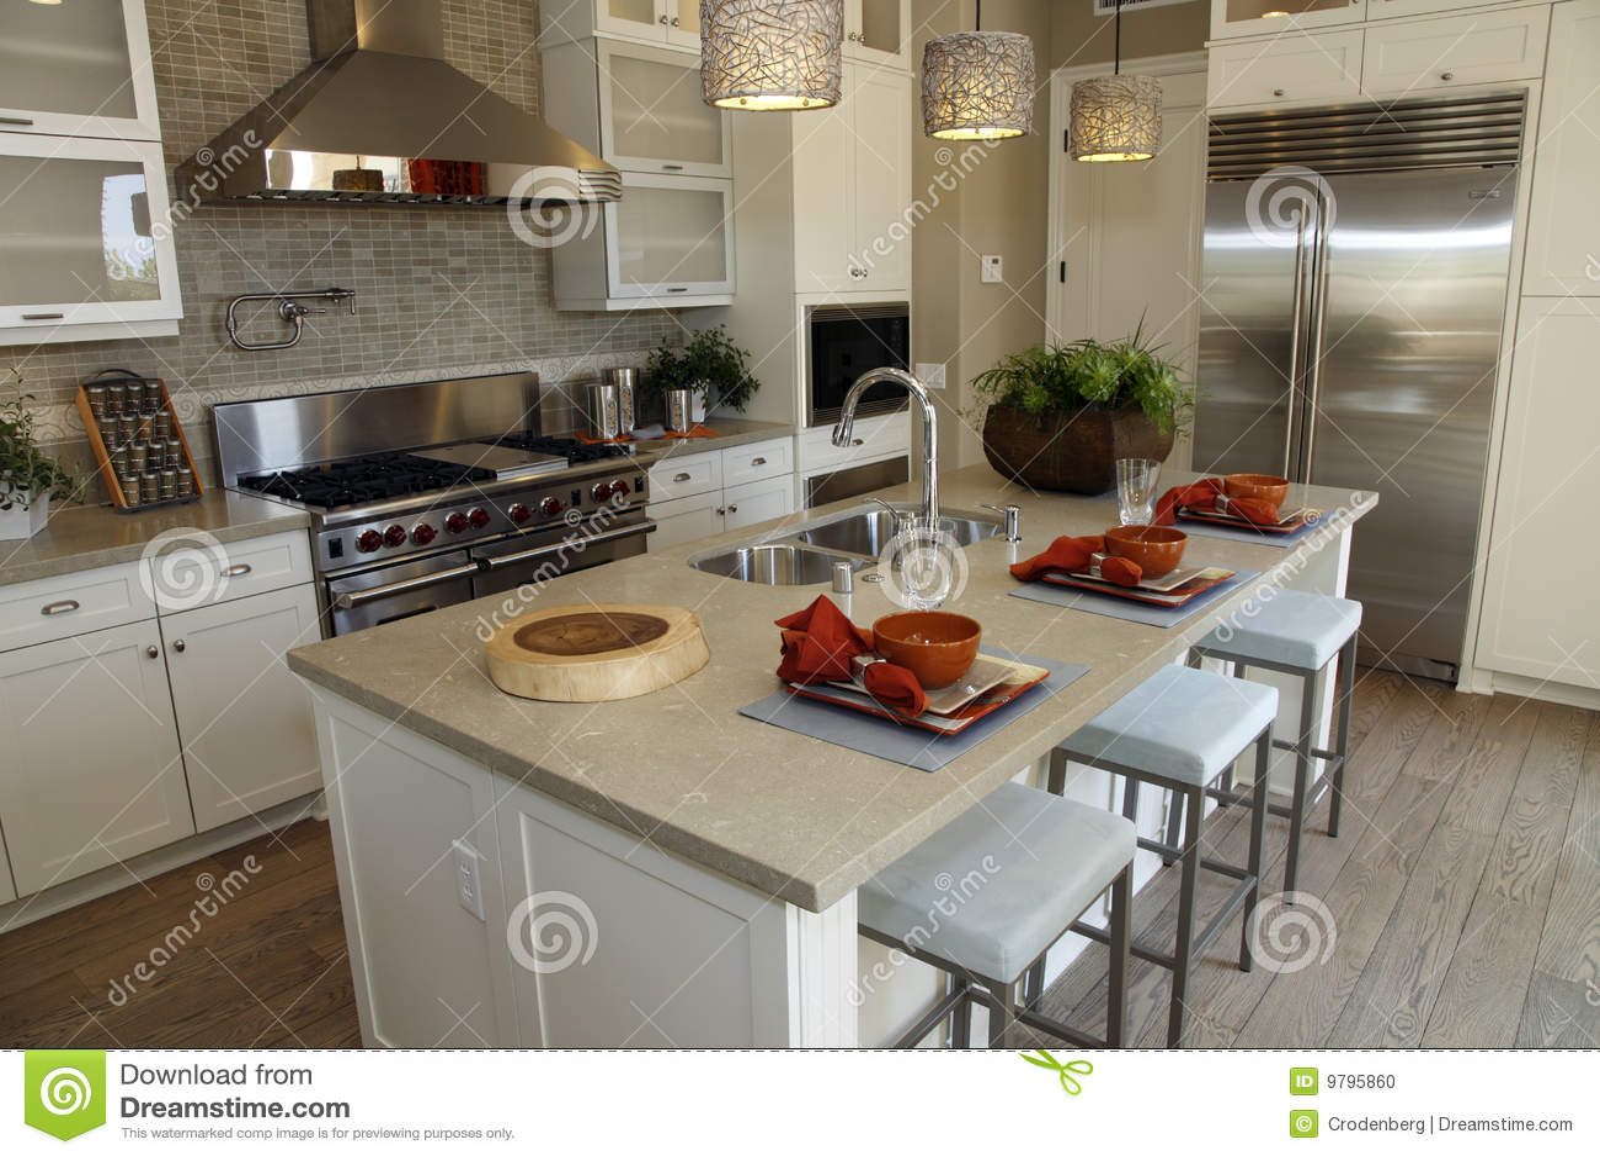 in stock kitchens kitchen wall mount faucet 家庭厨房豪华库存照片 图片包括有顶层 计数器 厨房 设计 住宅 豪华 家庭厨房豪华